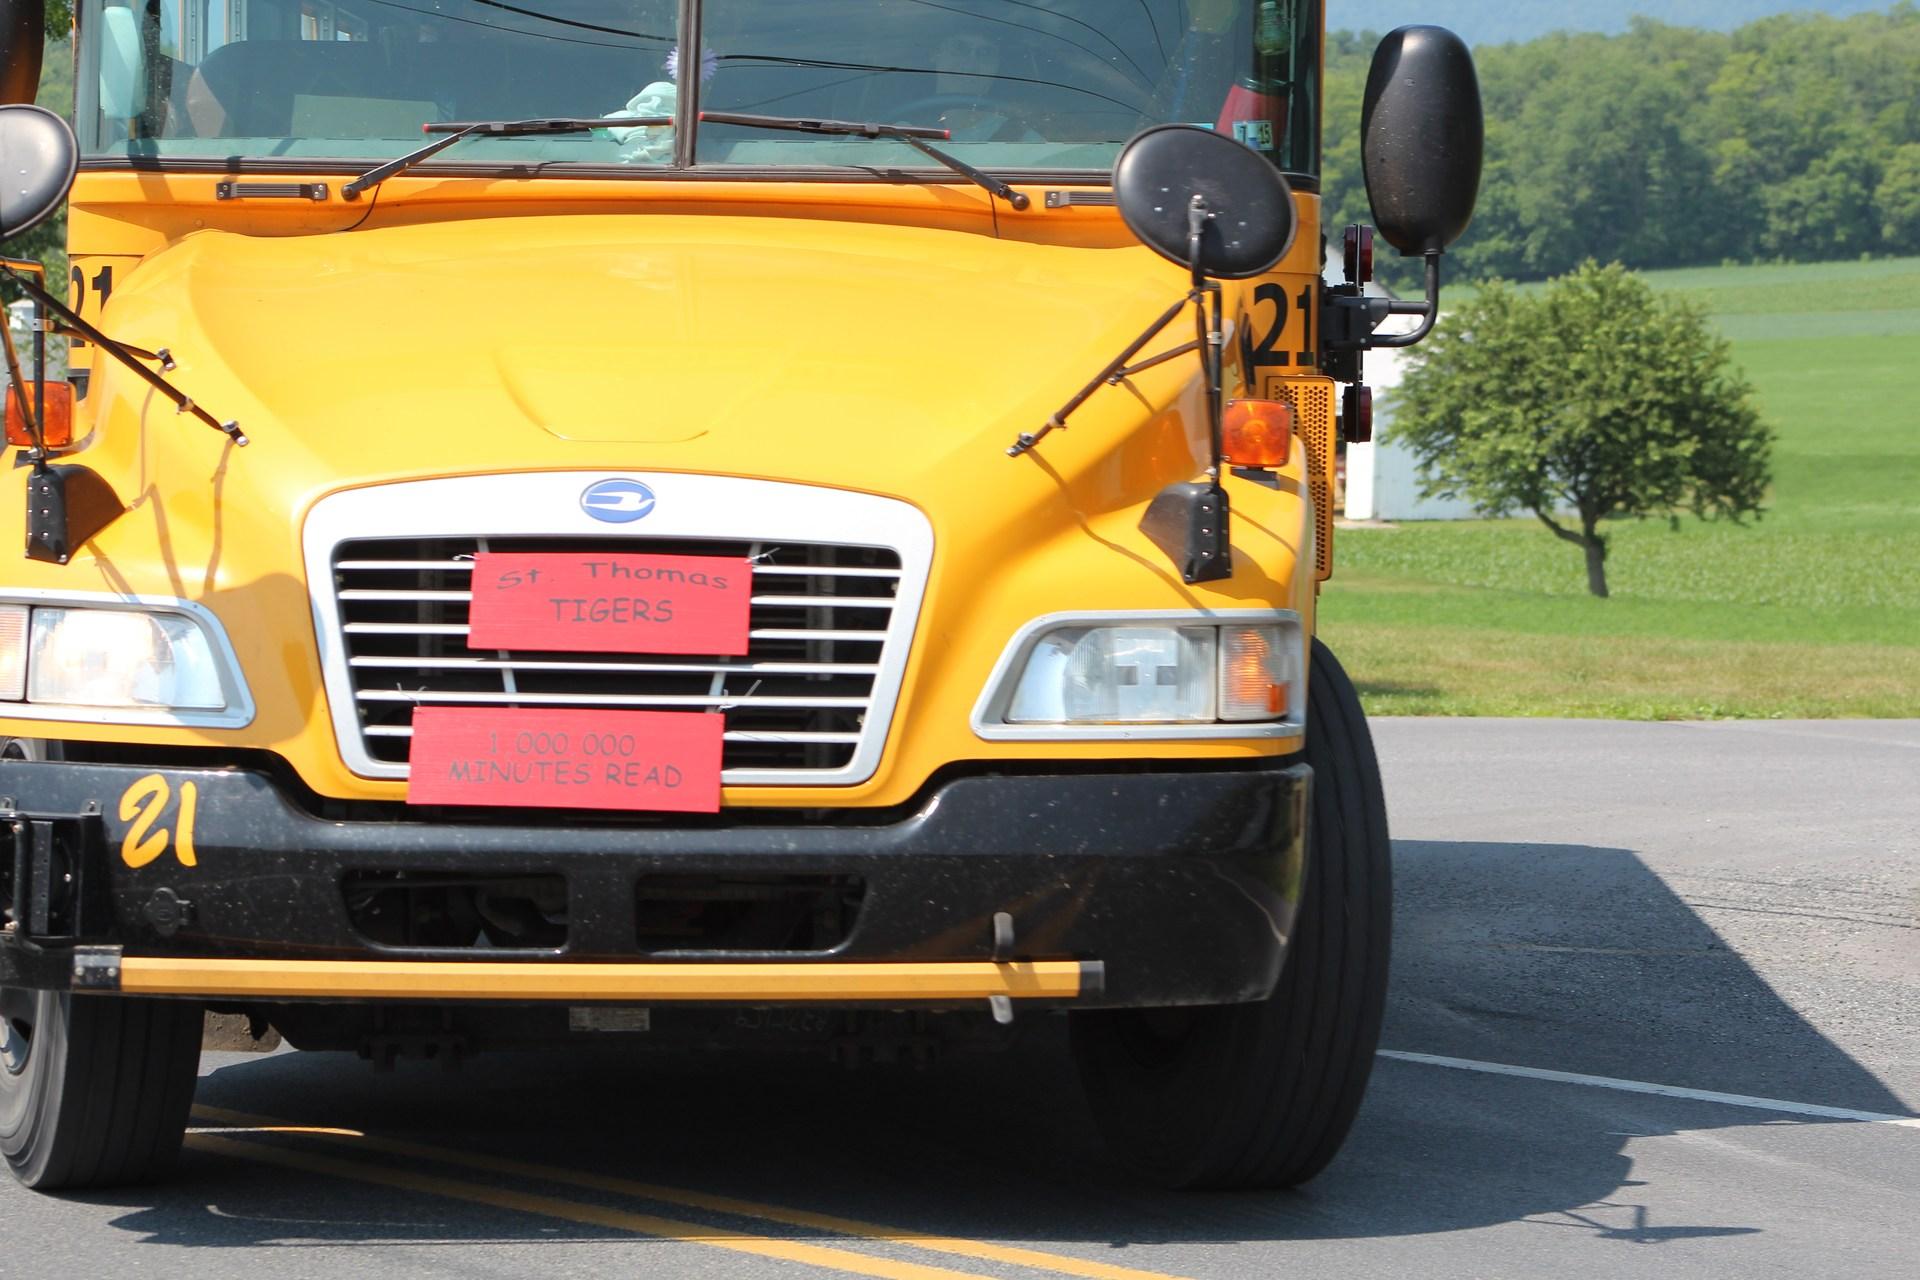 Miss Debb - Bus #21